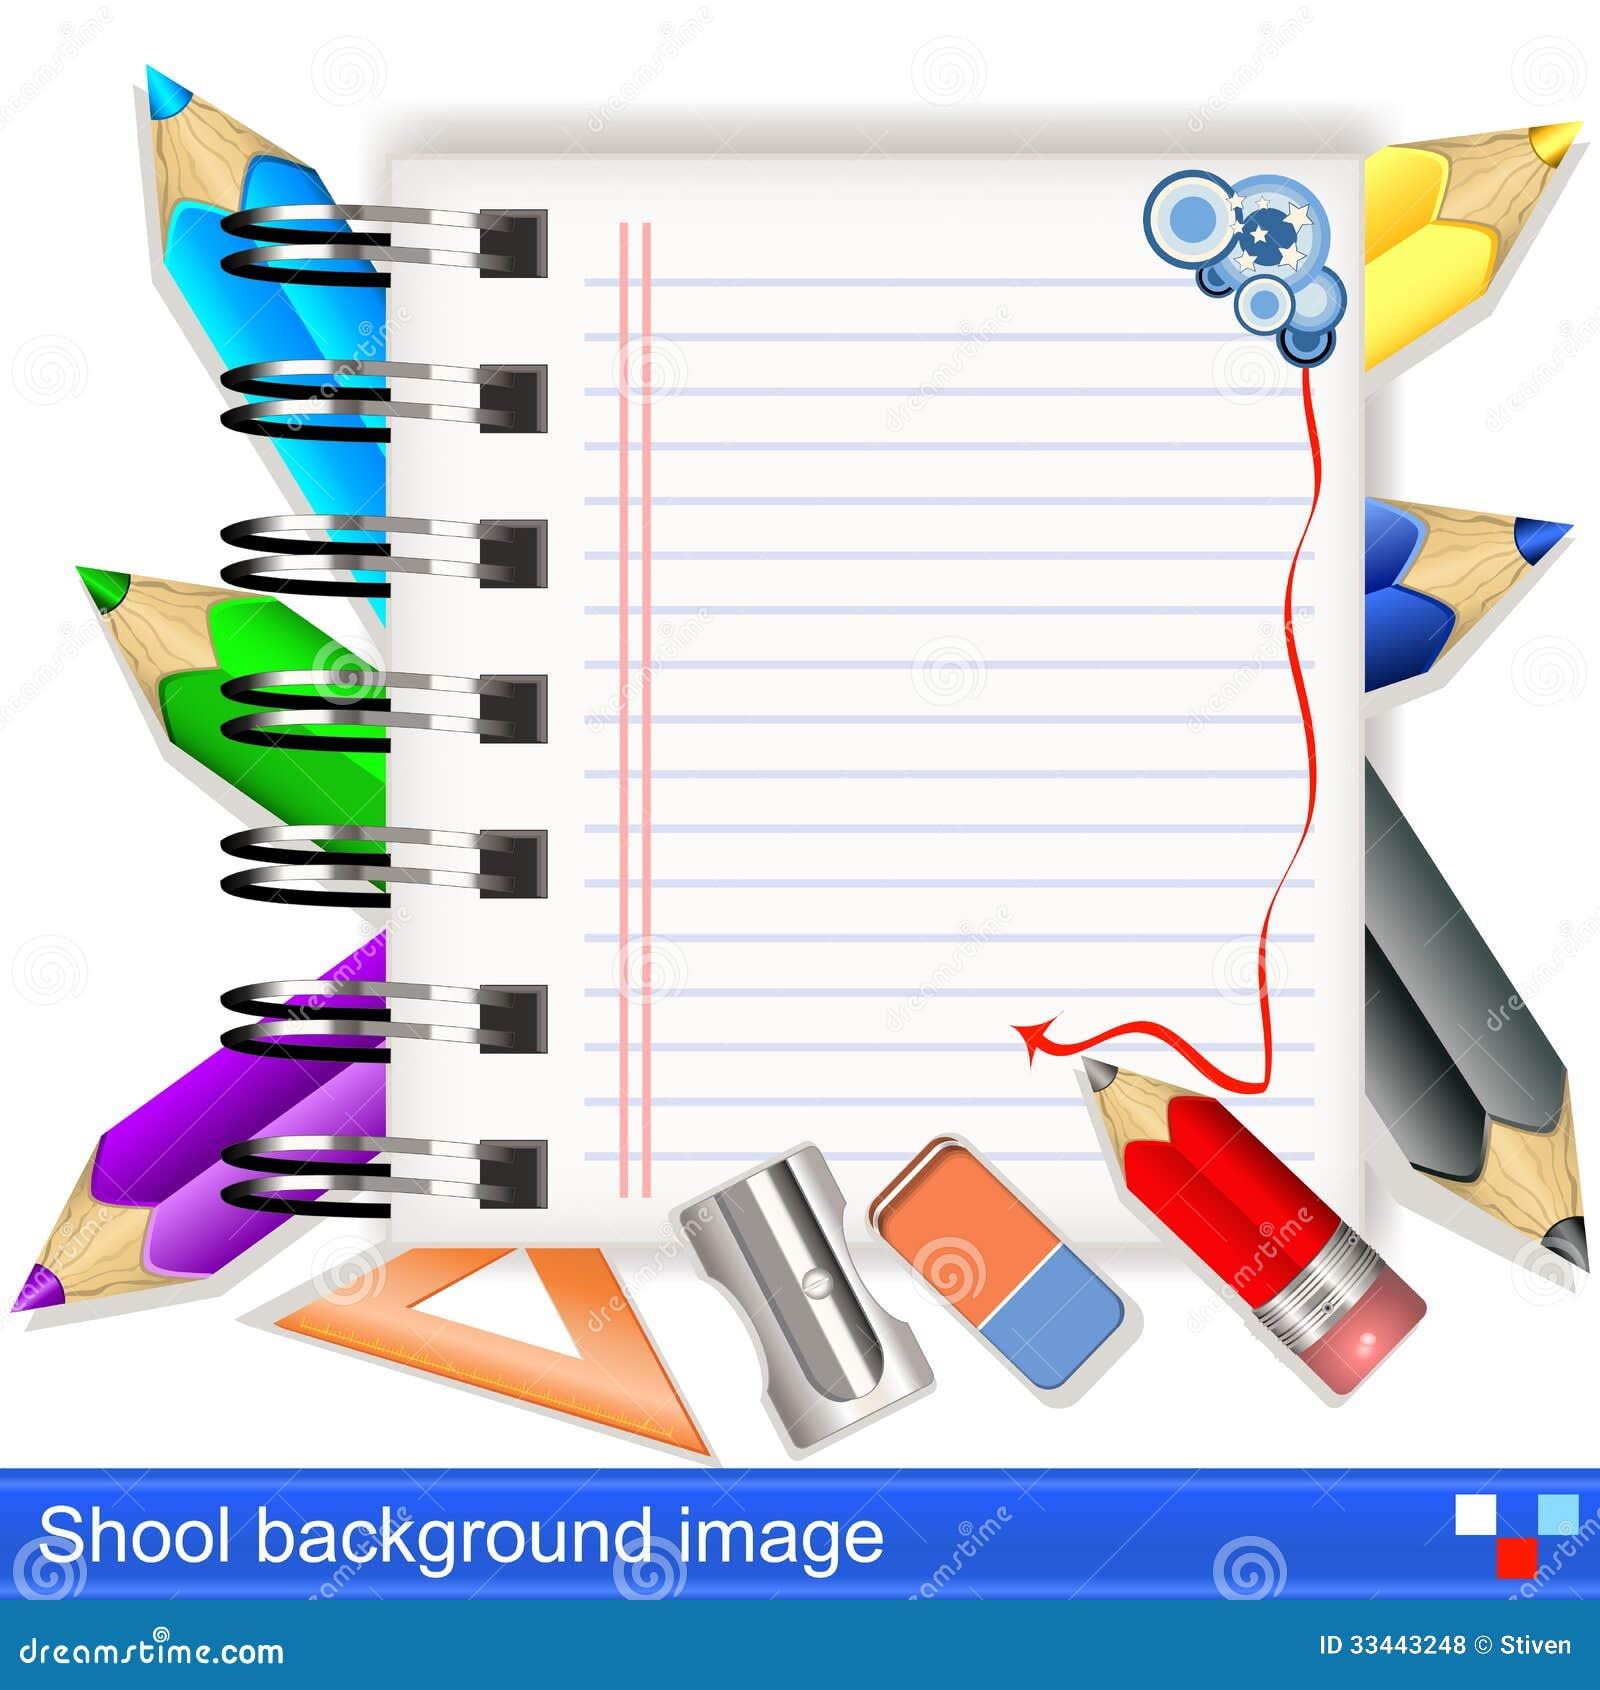 Vector School Background Image Royalty Free Stock Photos ...